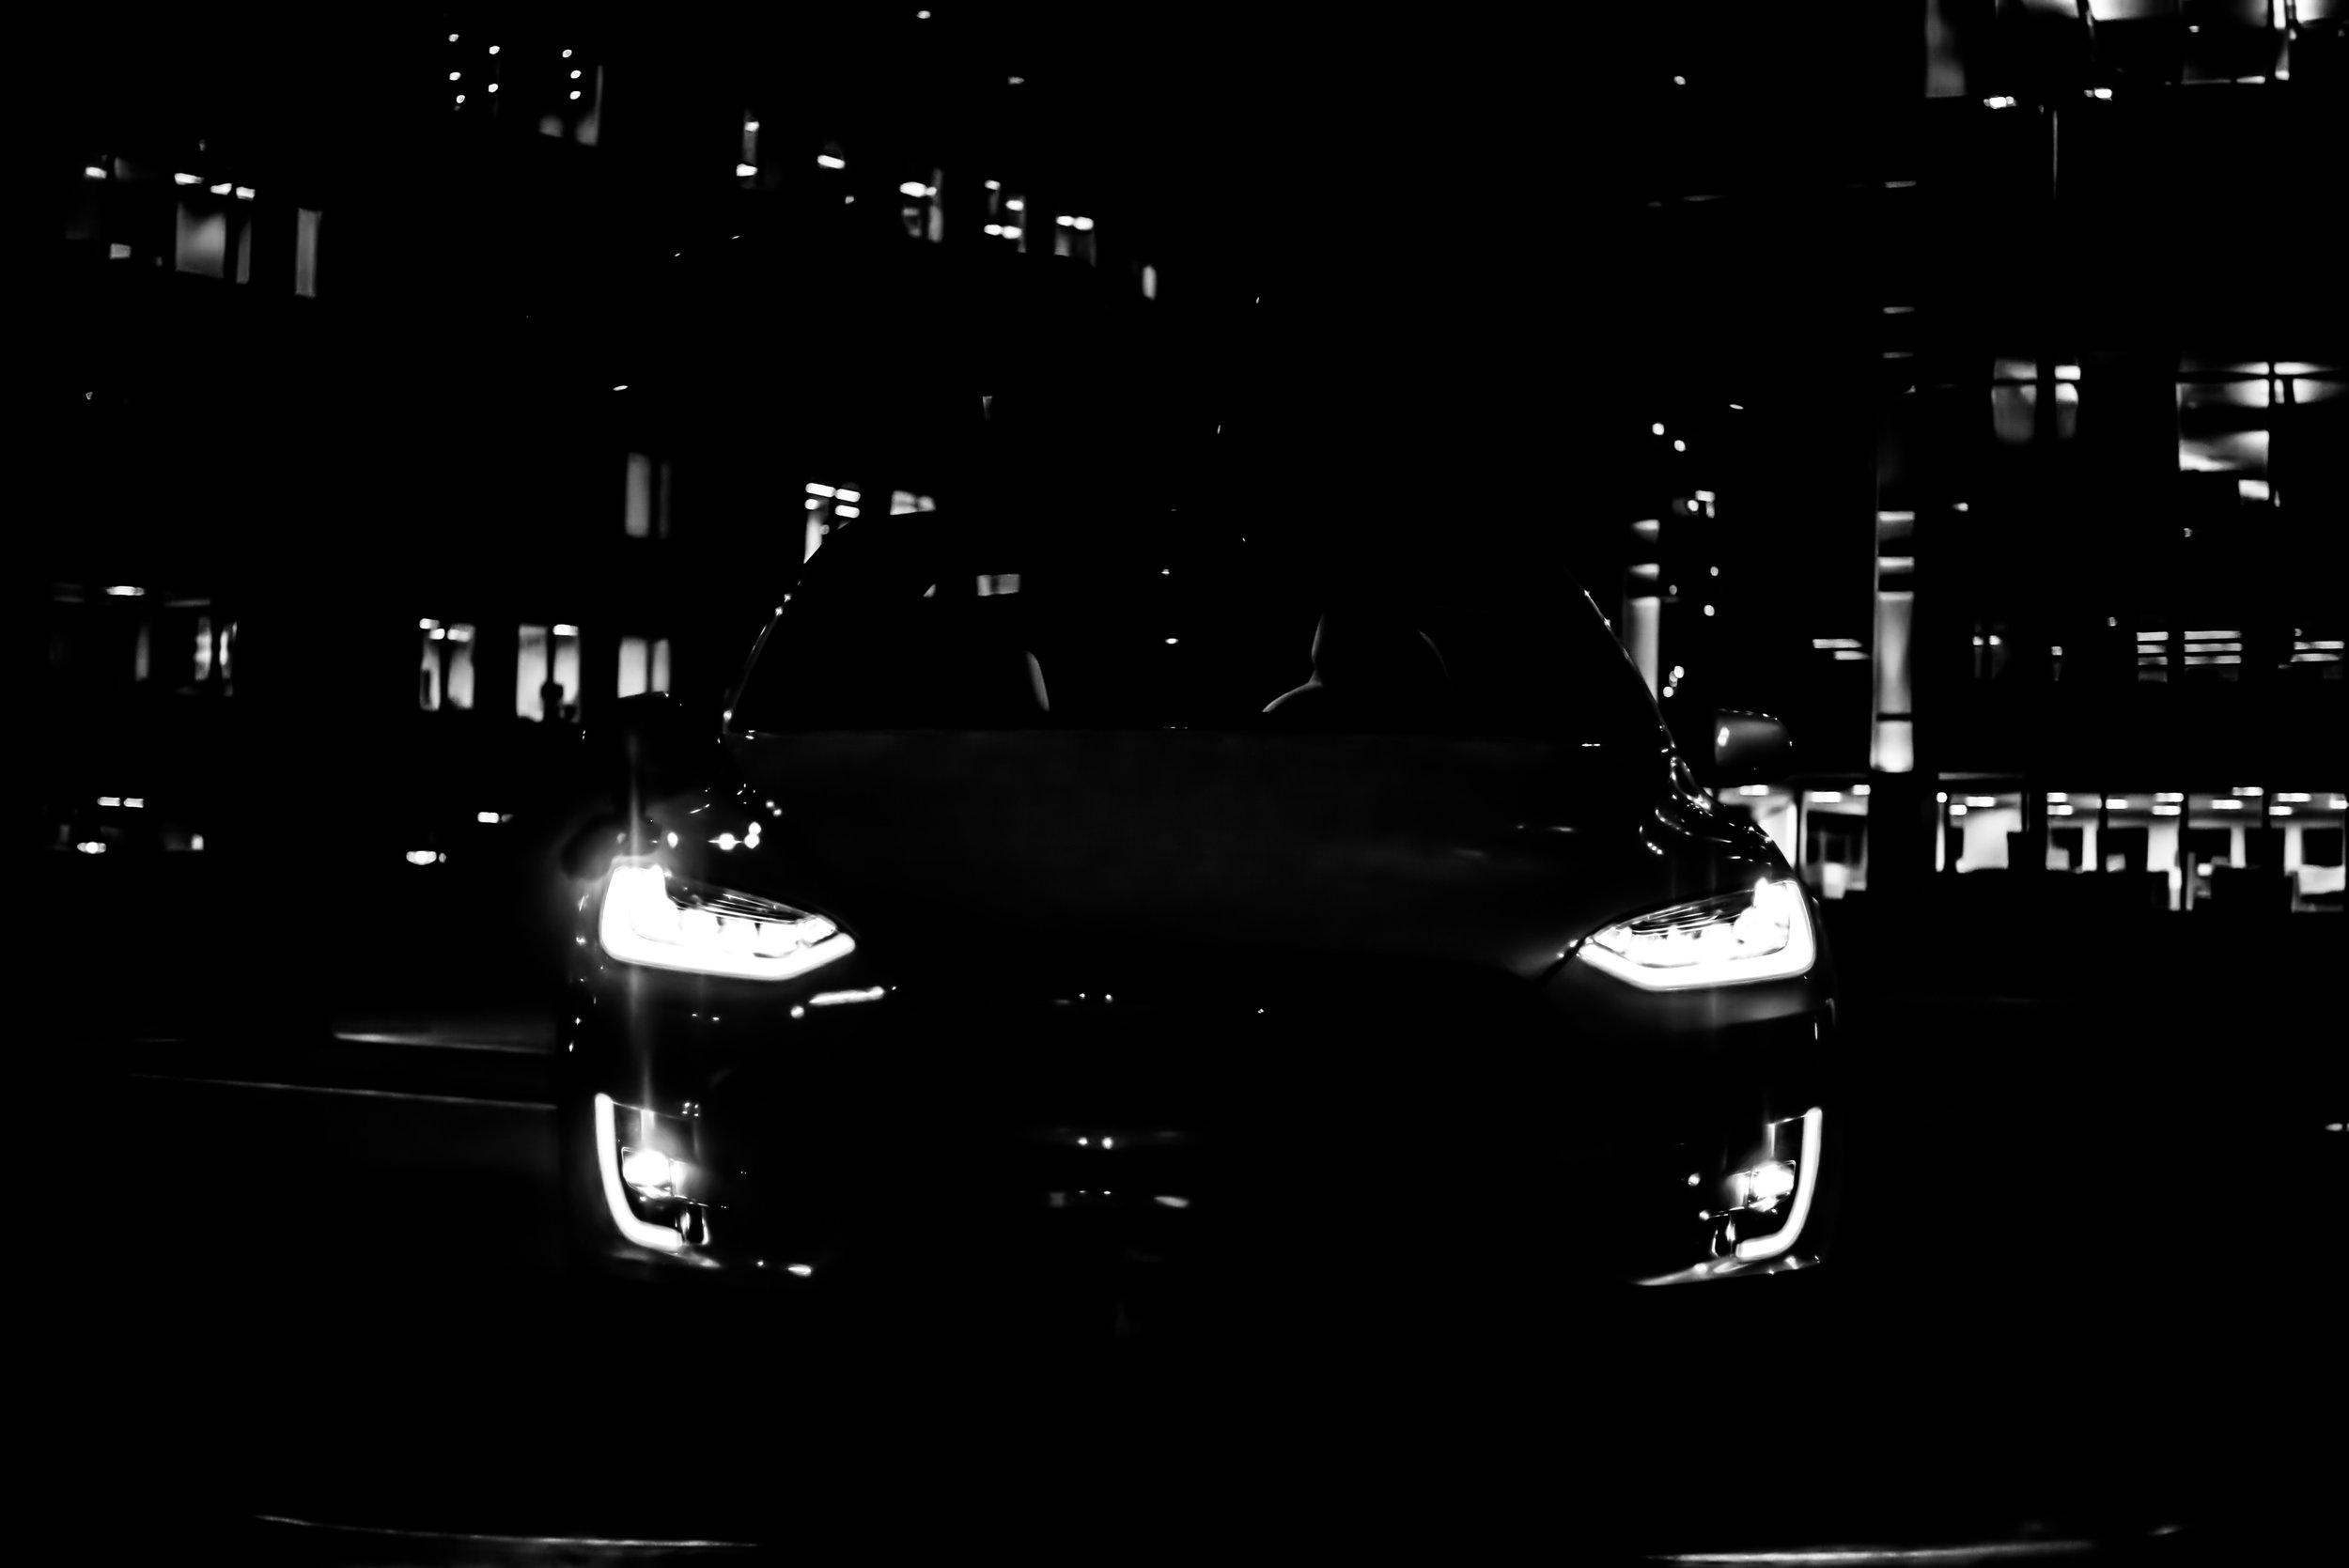 fleet+vehicle+sexy+car+photo+video+speed+tesla+p100d+vadym+guliuk+photography-13.jpg